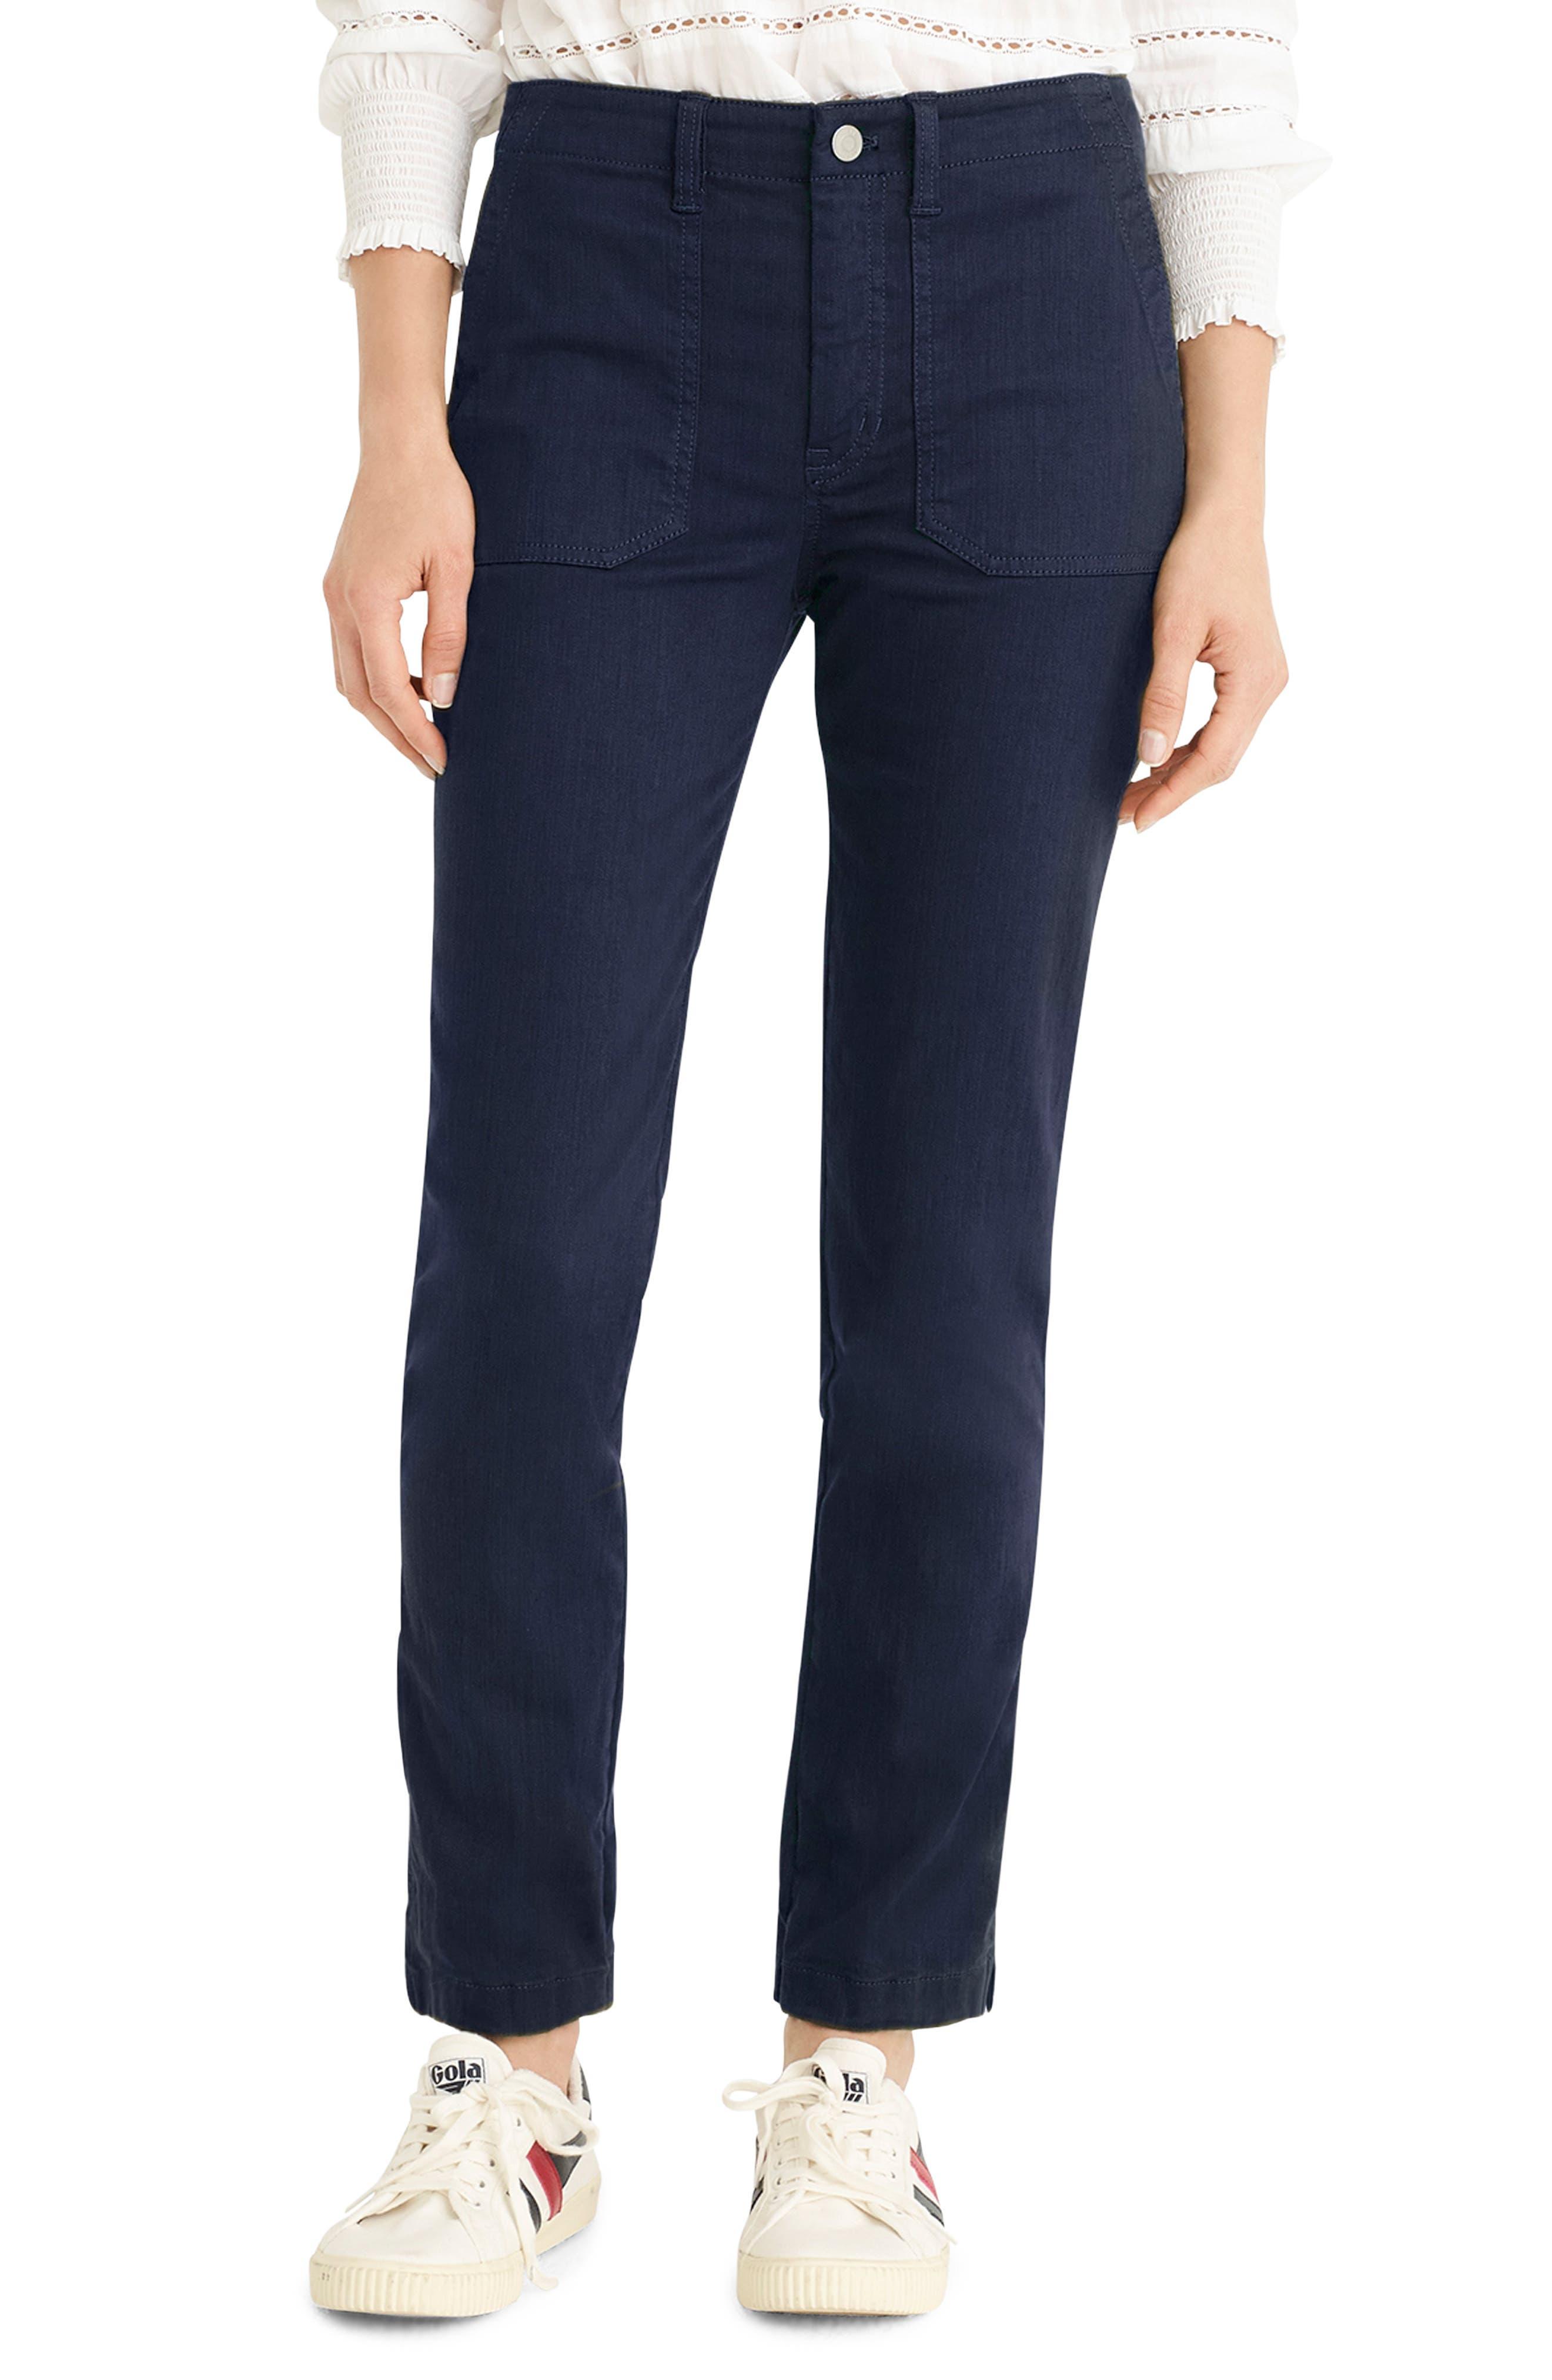 J.crew Slub Sateen Straight Leg Cargo Pants, 3 - Blue